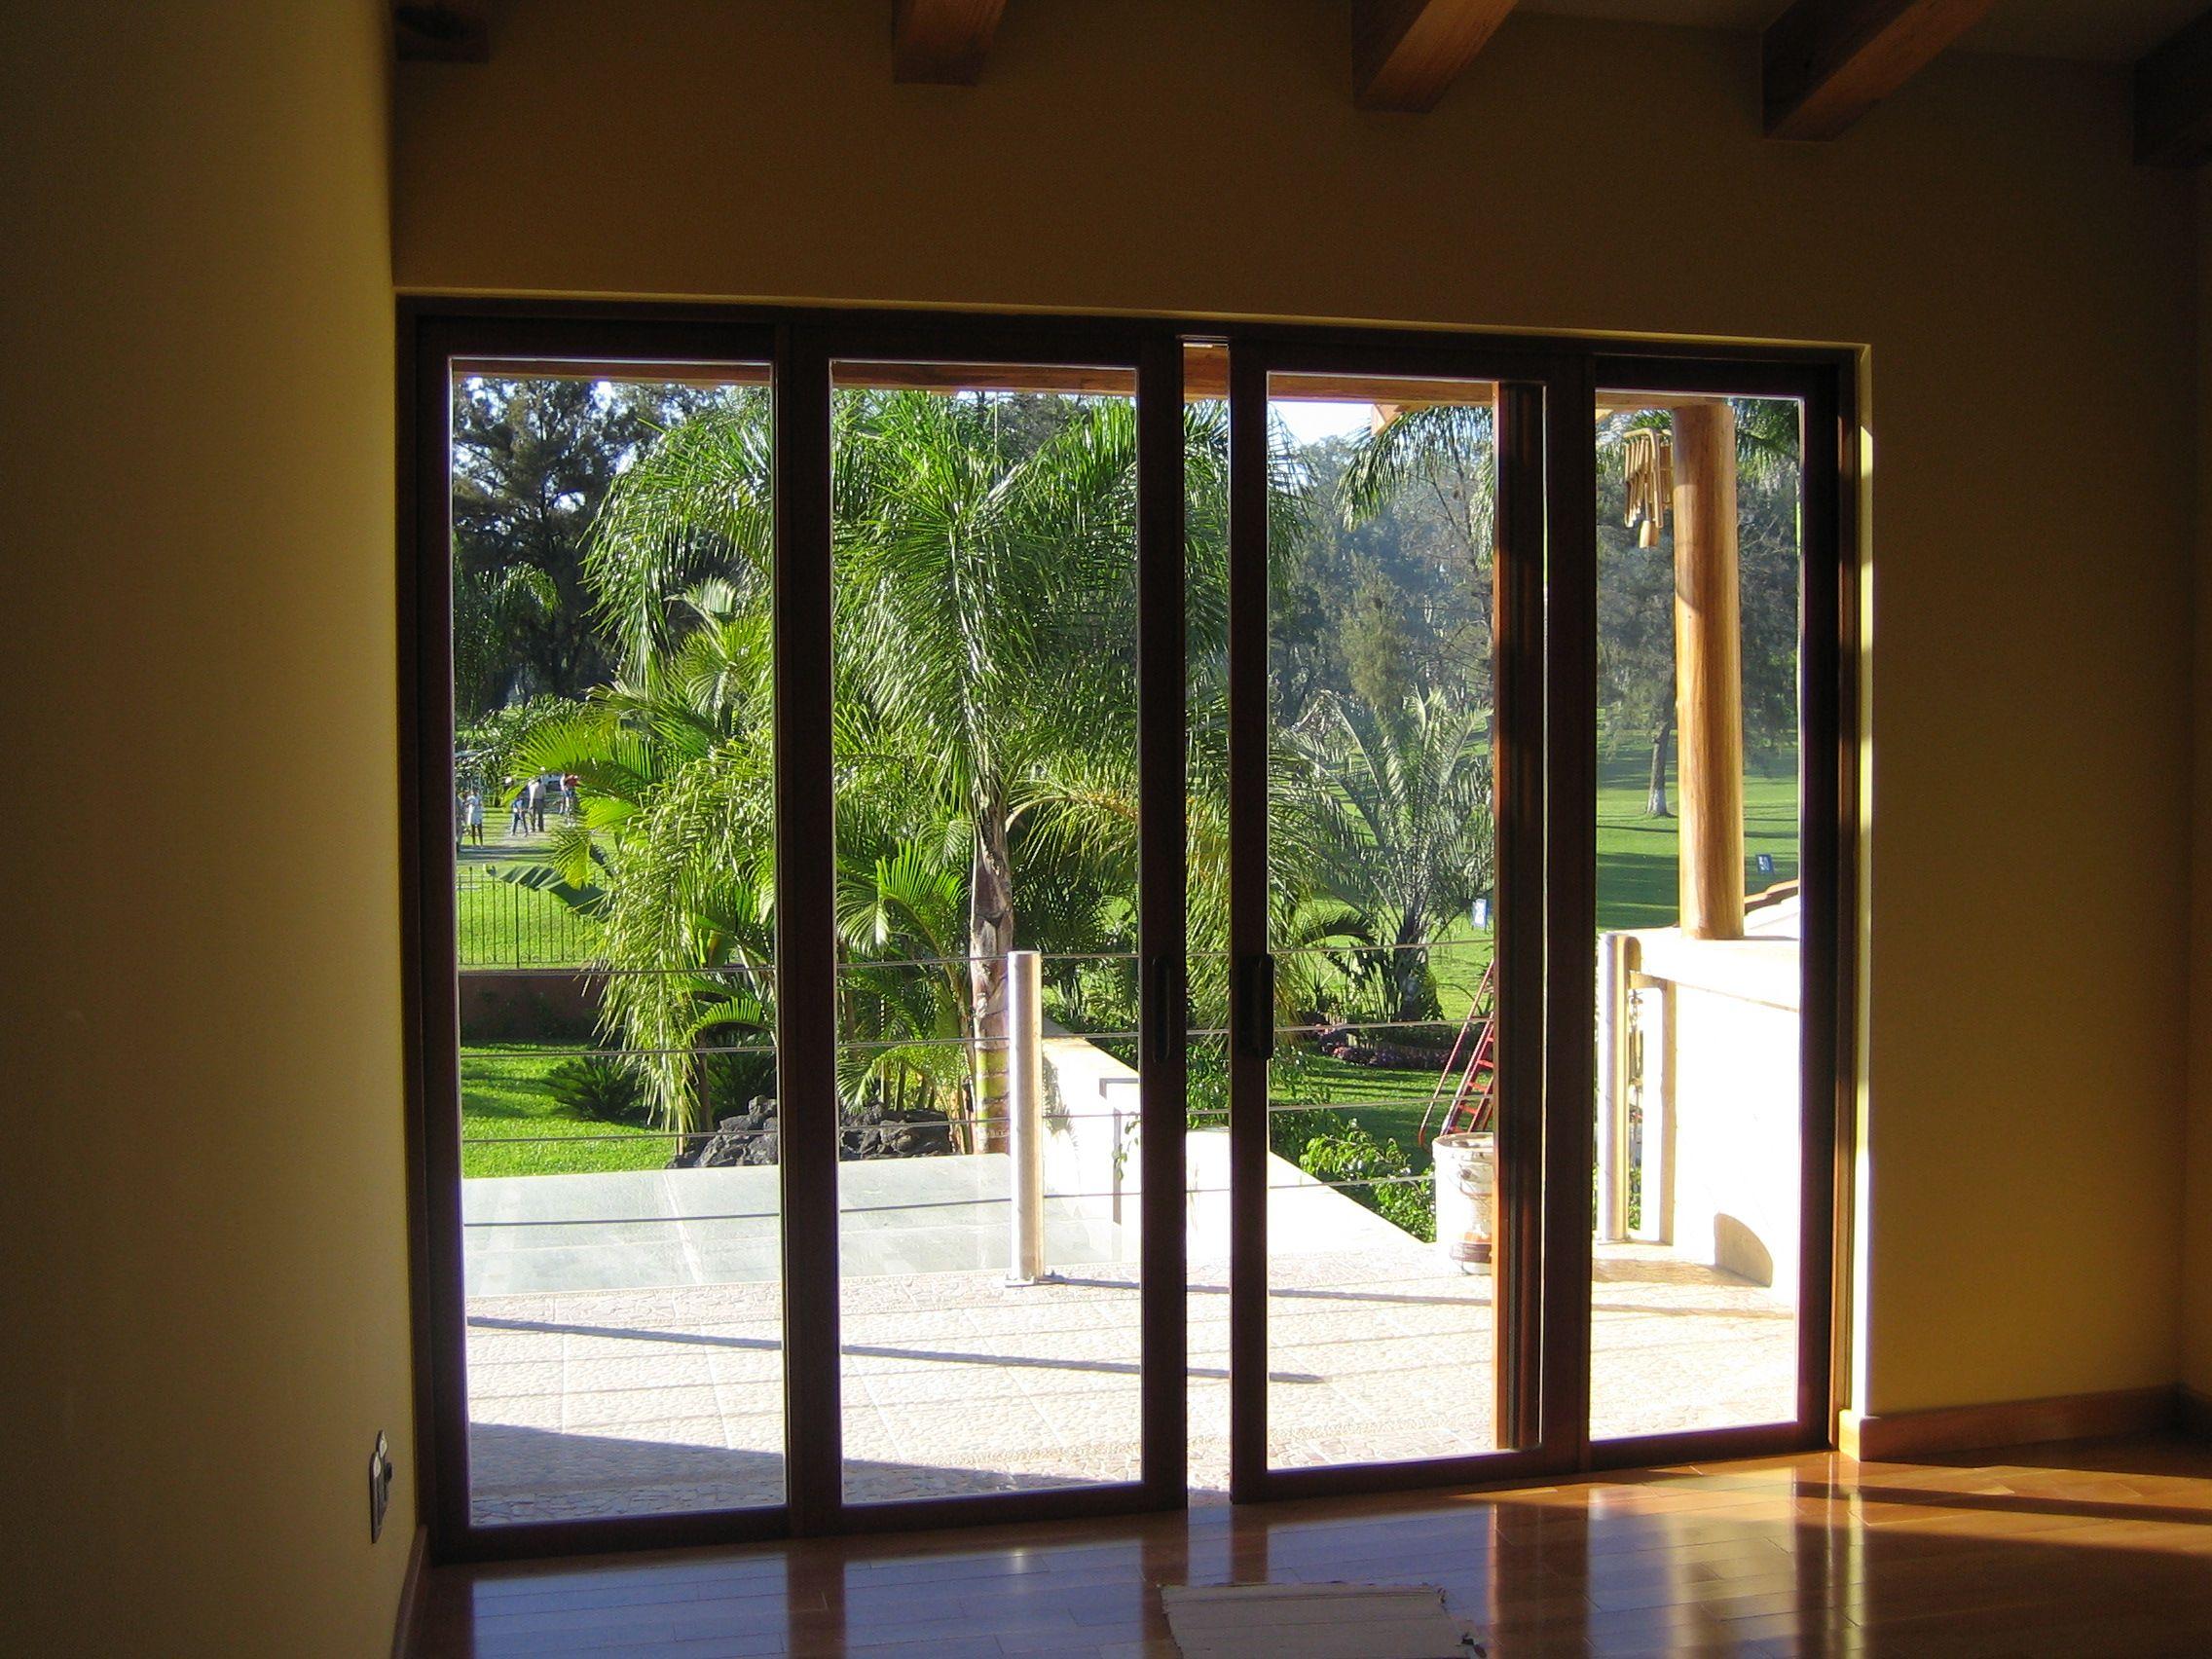 Puertas corredizas de madera ventana ventanademadera for Puerta ventana de aluminio corrediza